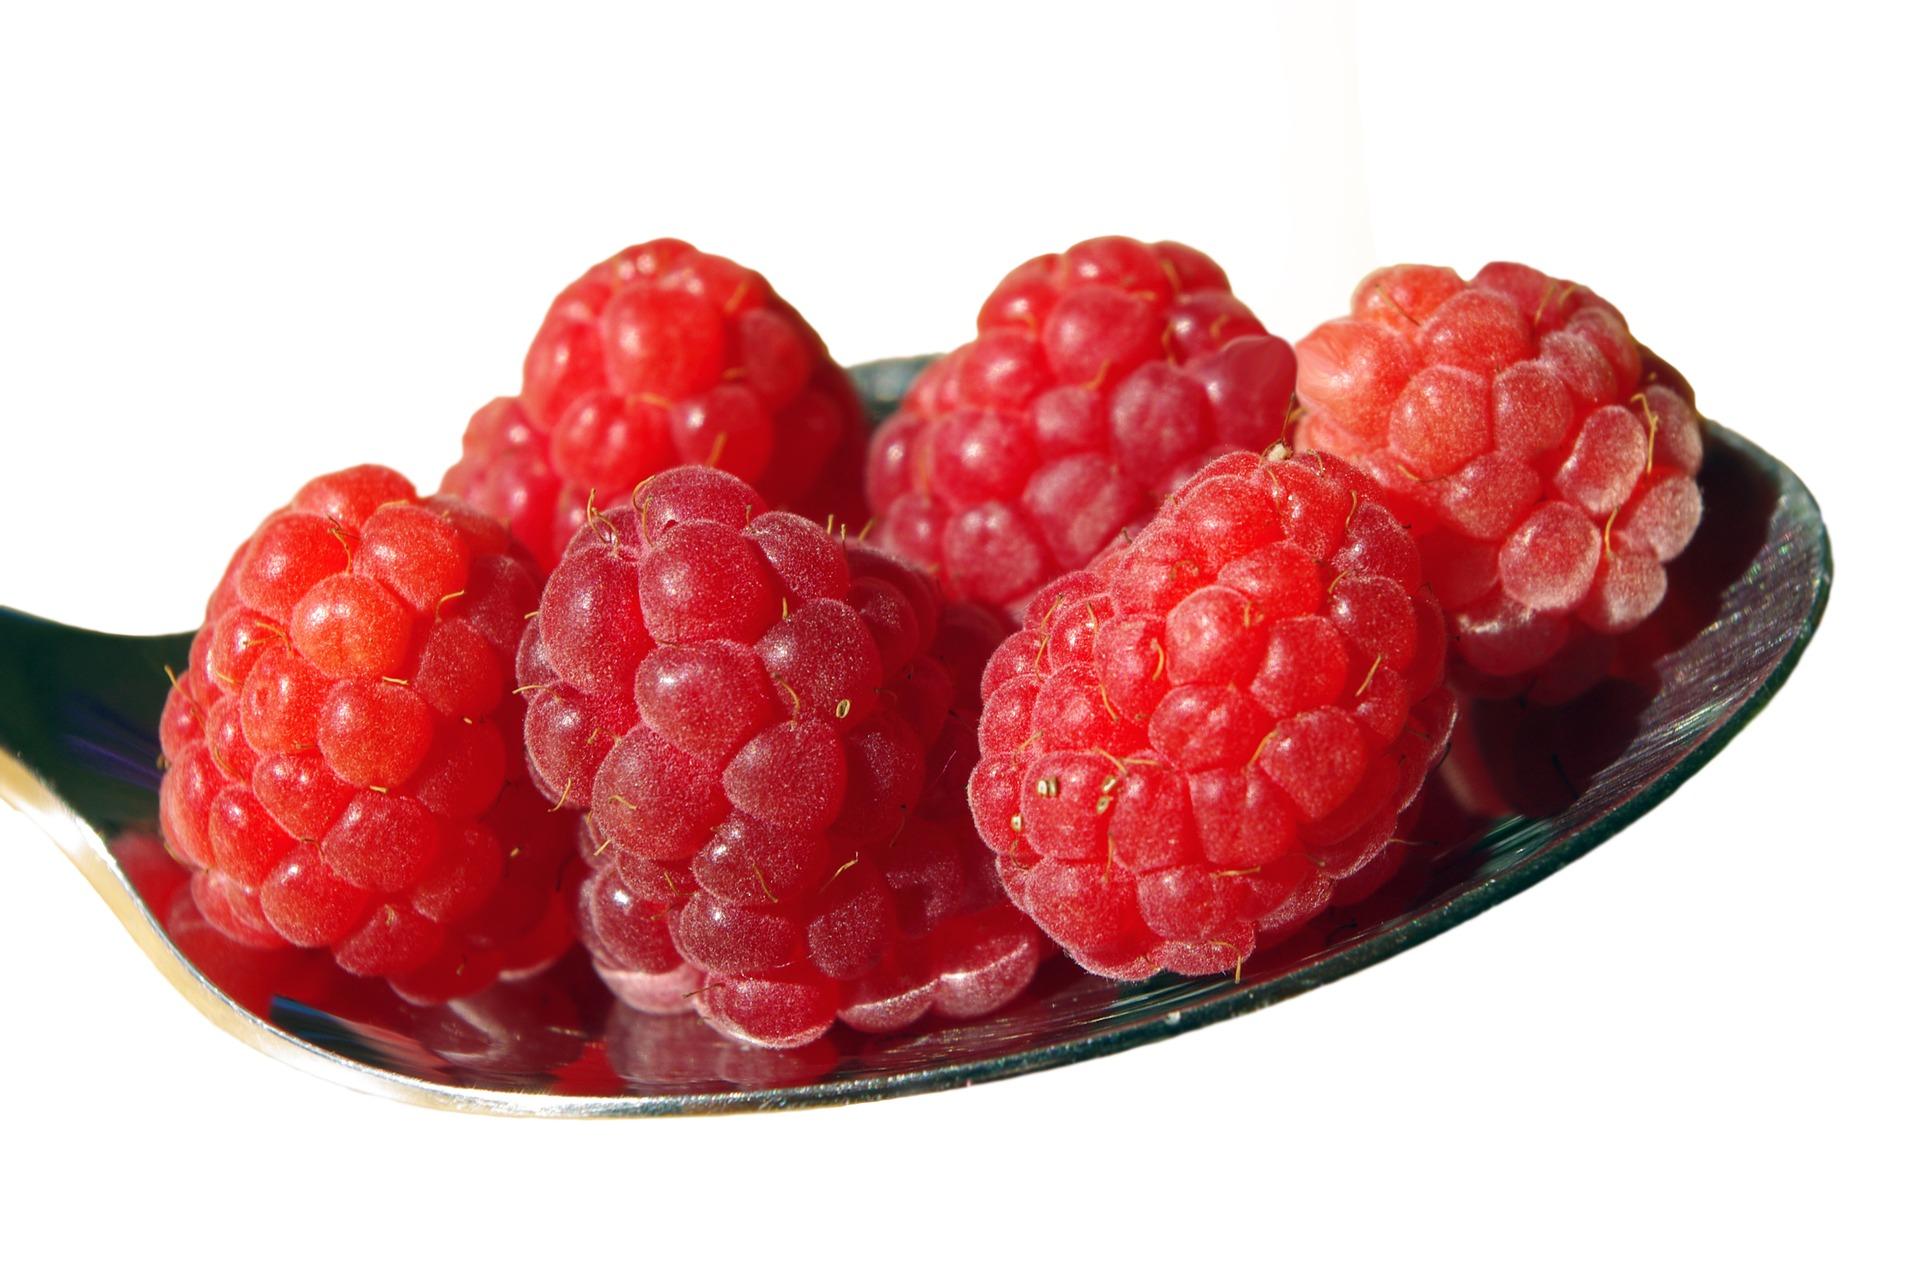 raspberries-1338034_1920